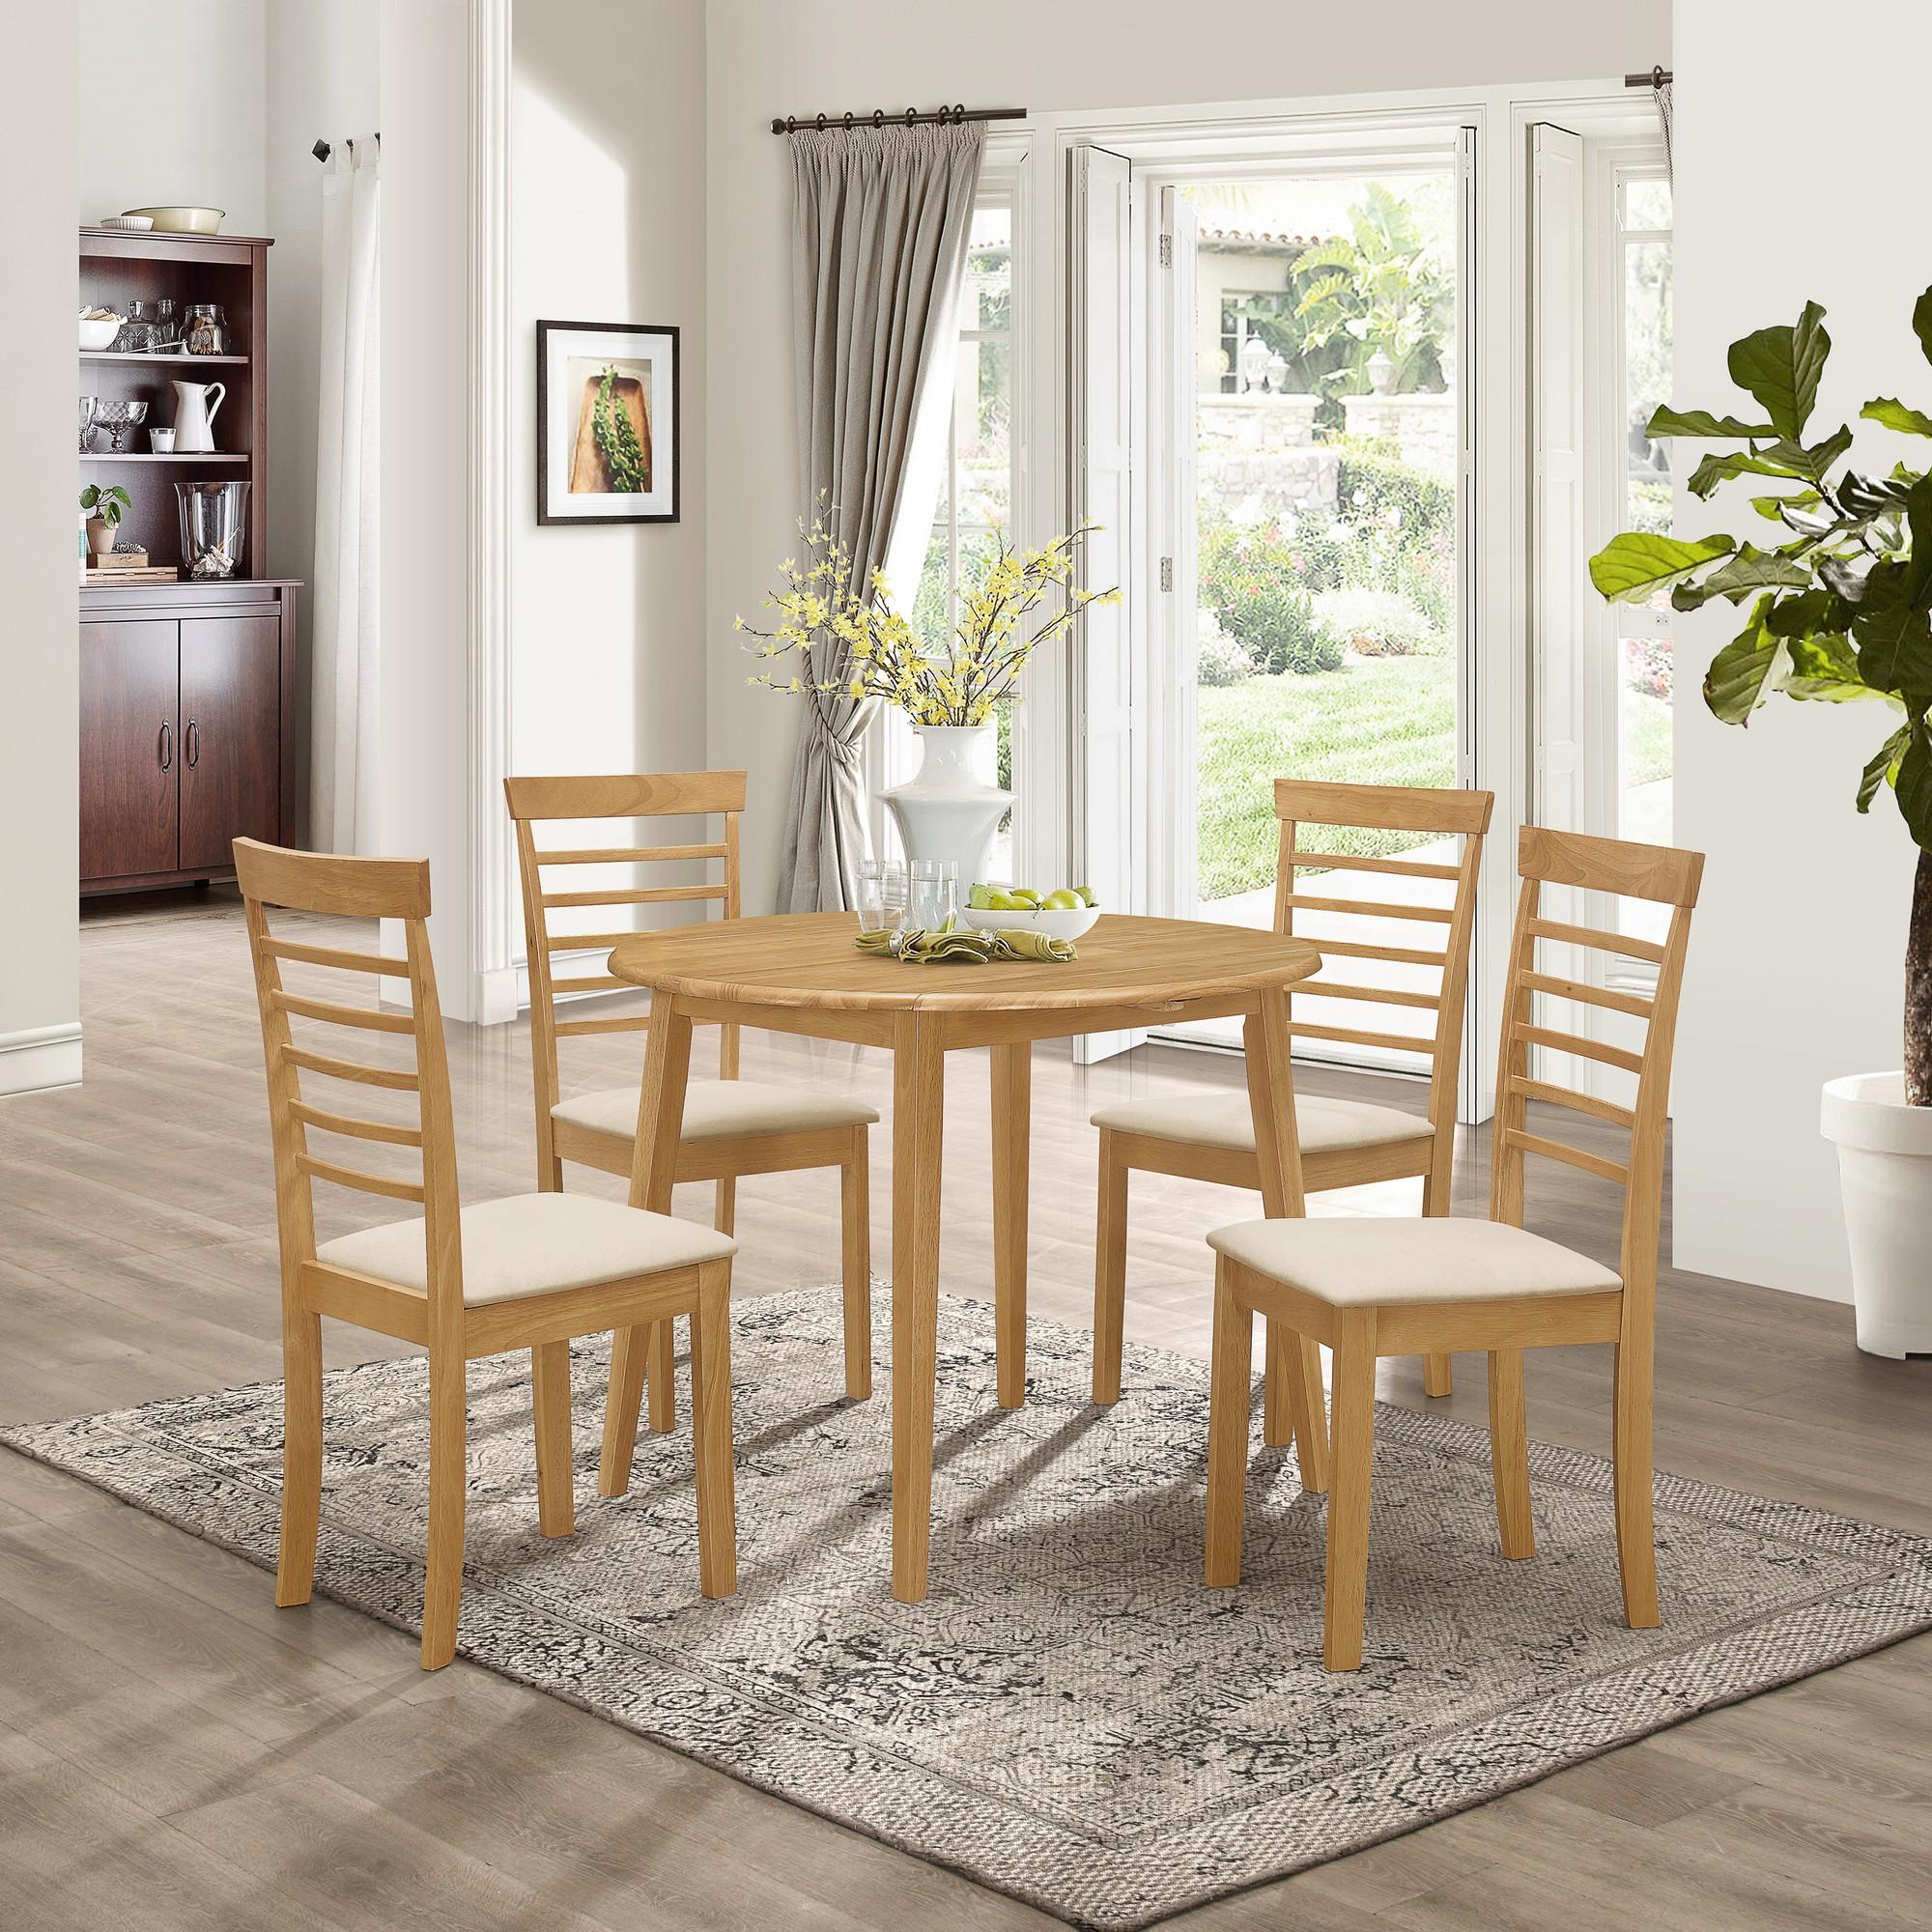 Ledbury Solid Rubber Wood Drop Leaf Kitchen Dining Round Table Set